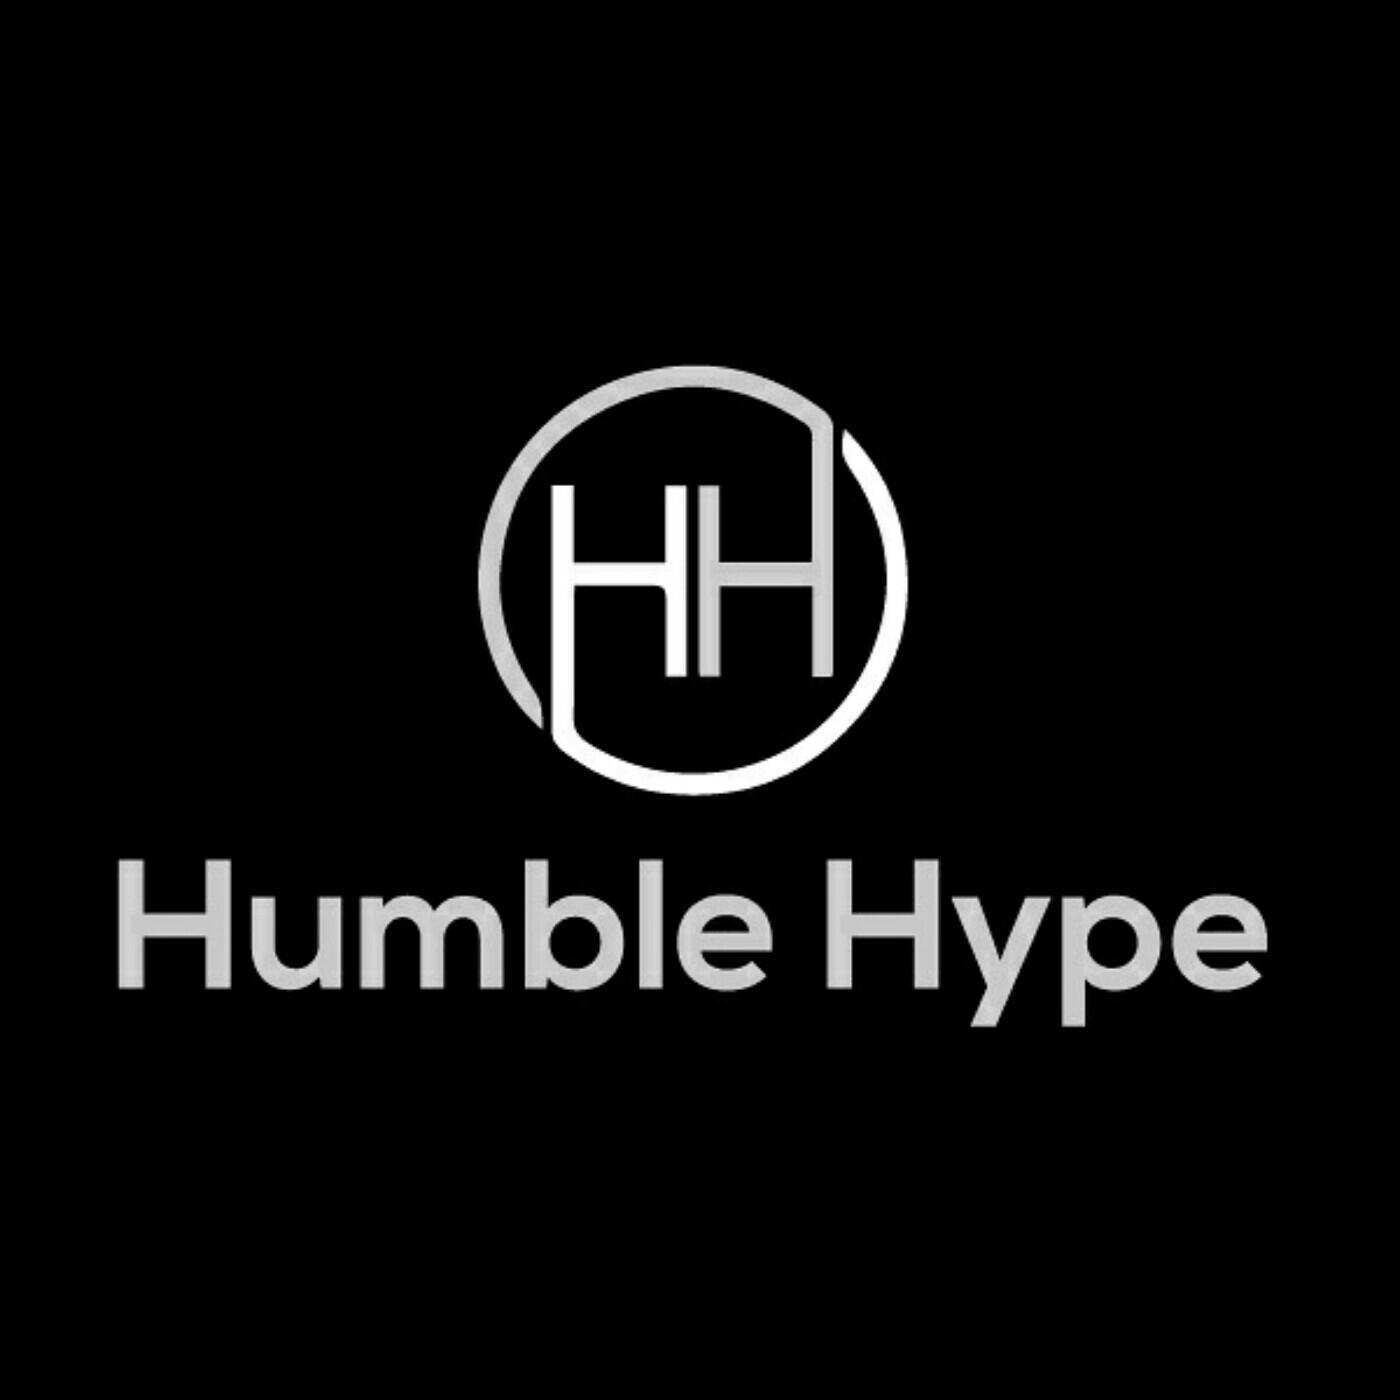 Humble Hype